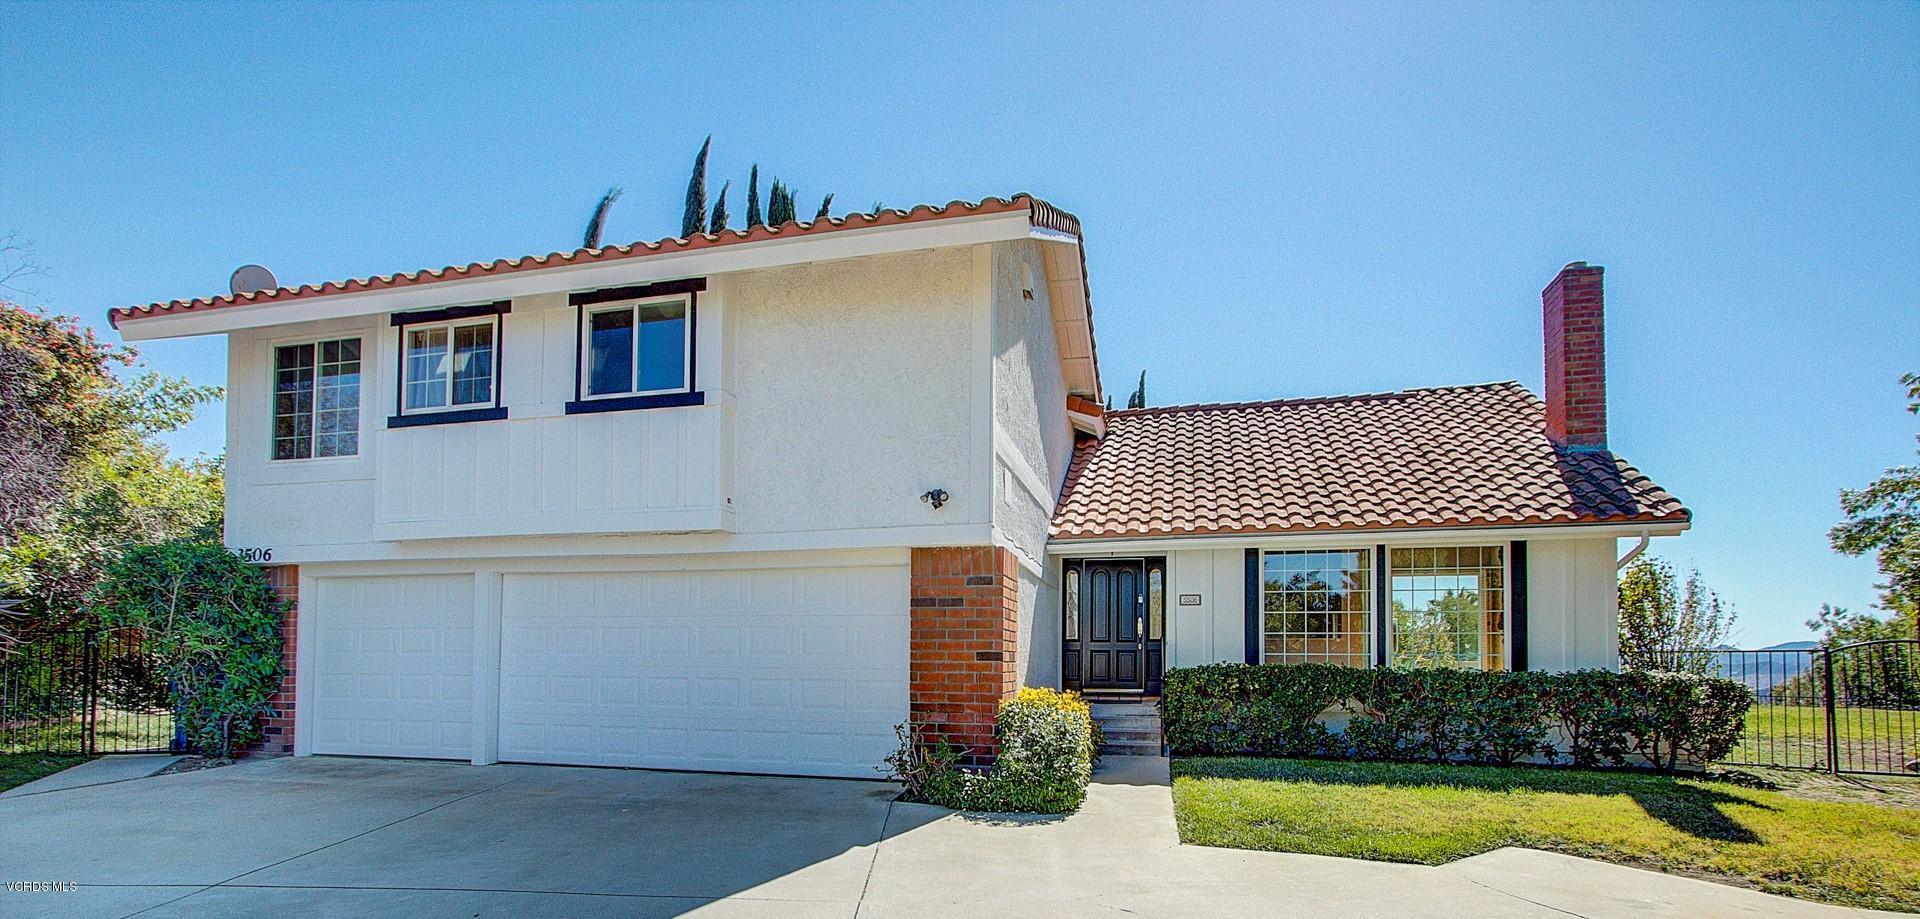 3506 N Quarzo Circle, Thousand Oaks, CA 91362